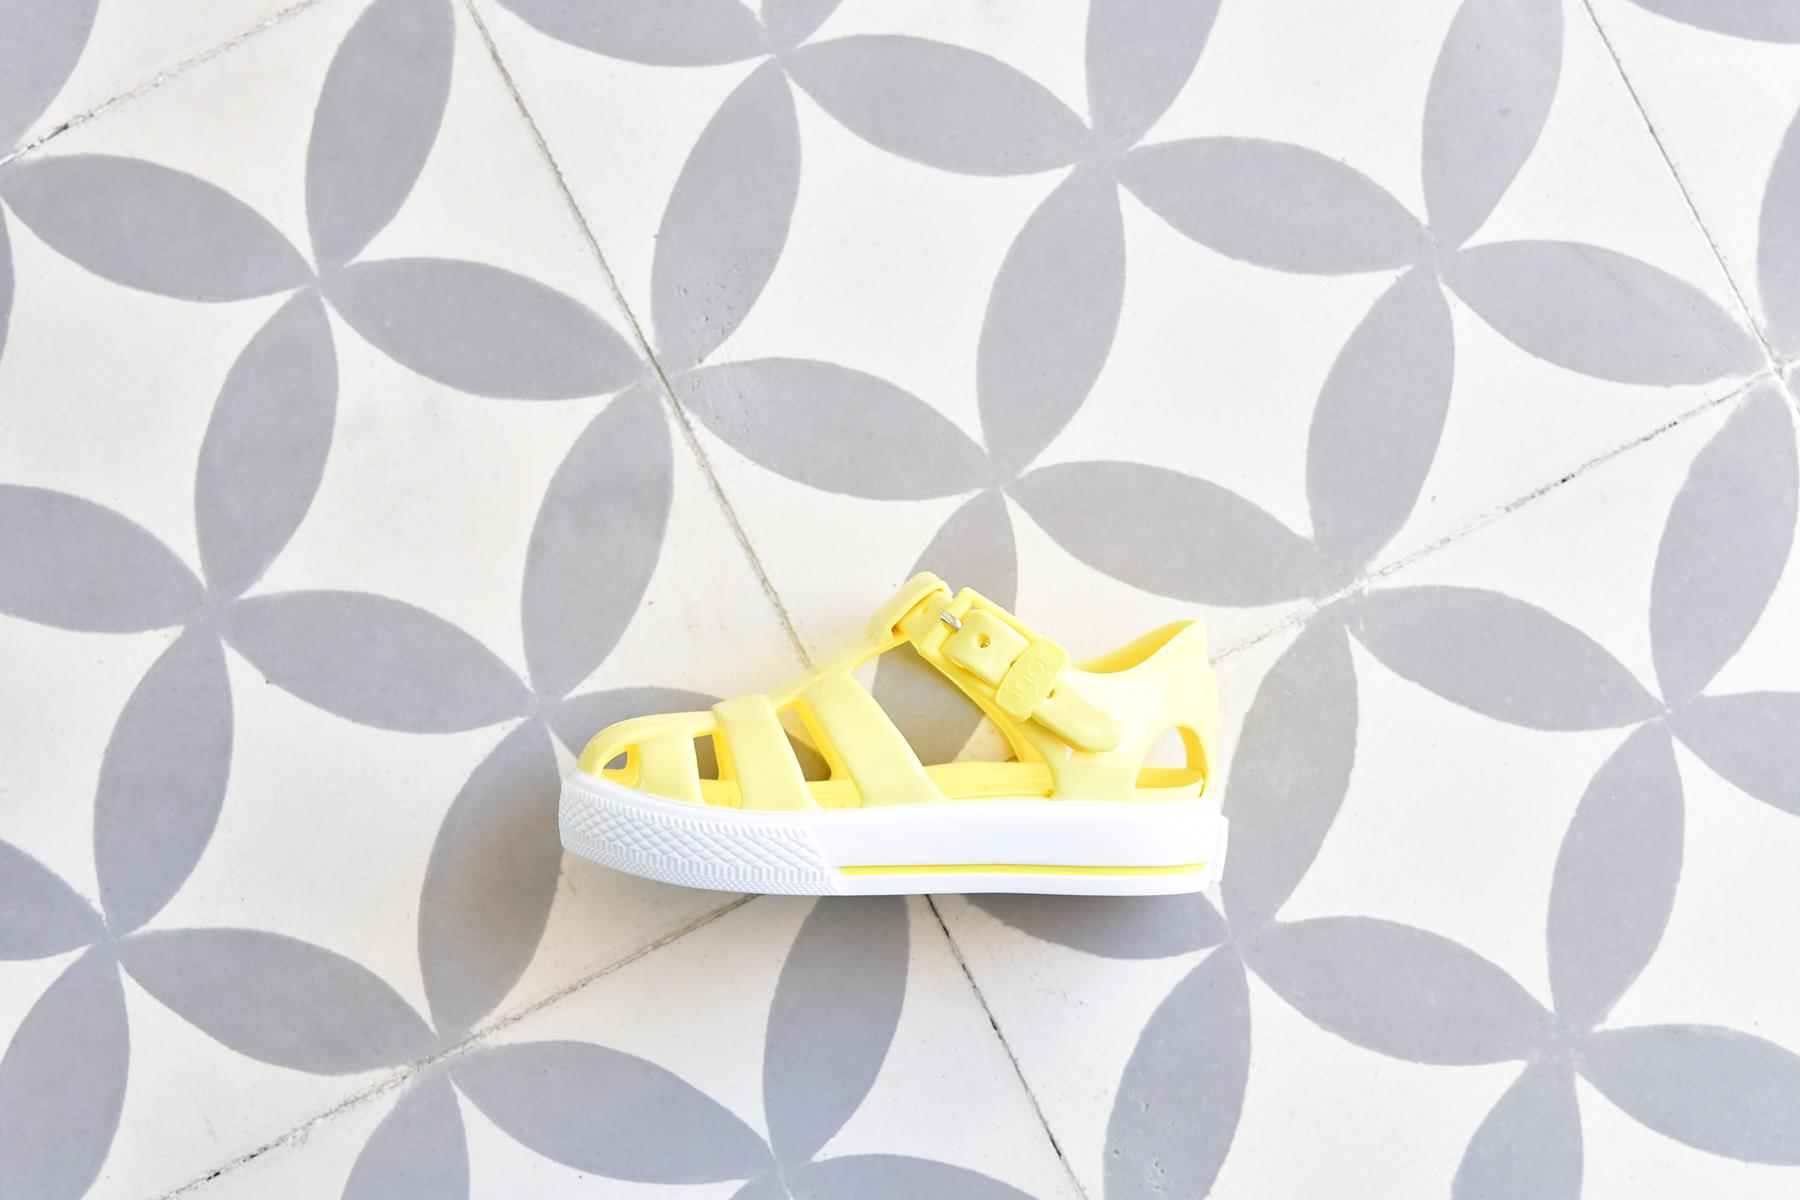 Sandalias de Goma tipo Cangrejera | Cangrejeras, Zapatos